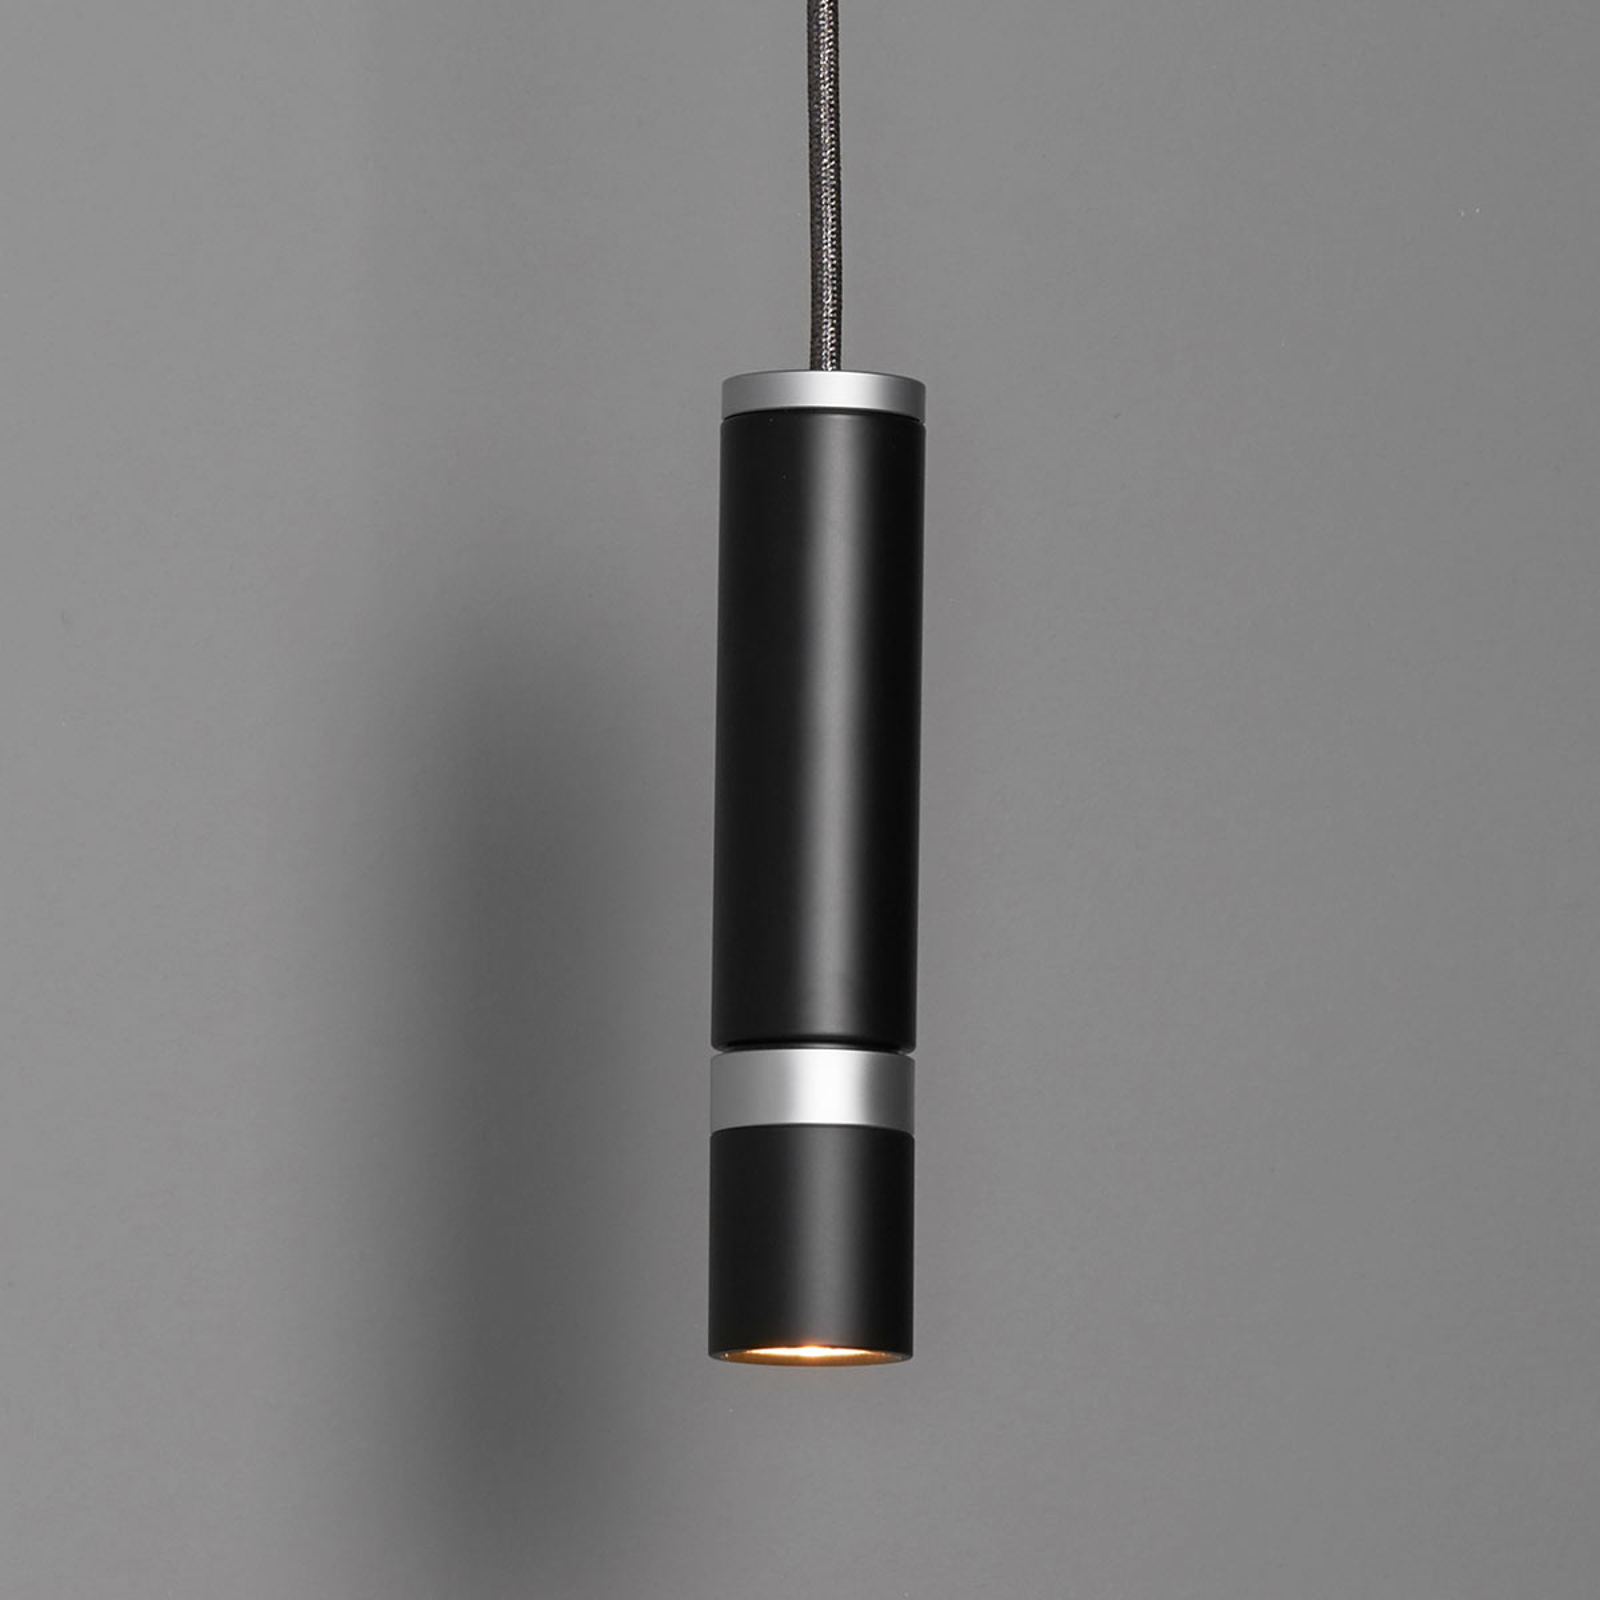 LDM Kyno Tavolo Uno LED-hængelampe, mat sort